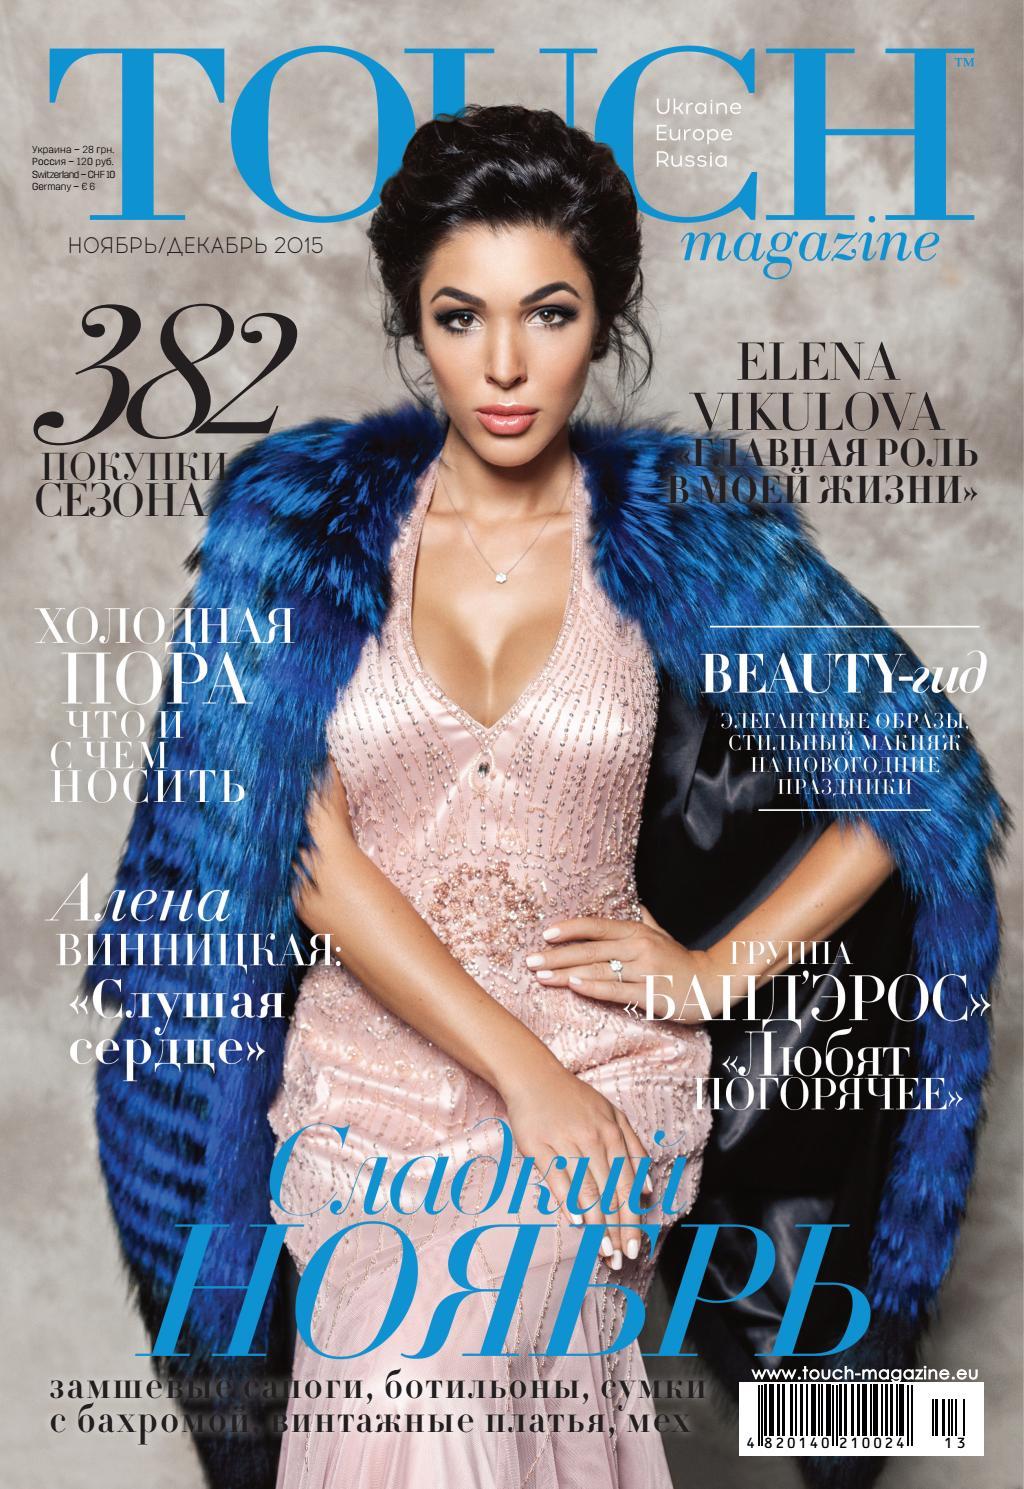 6c4a18481c1 Touch ноябрь 2015 by Nastya Boiko - issuu